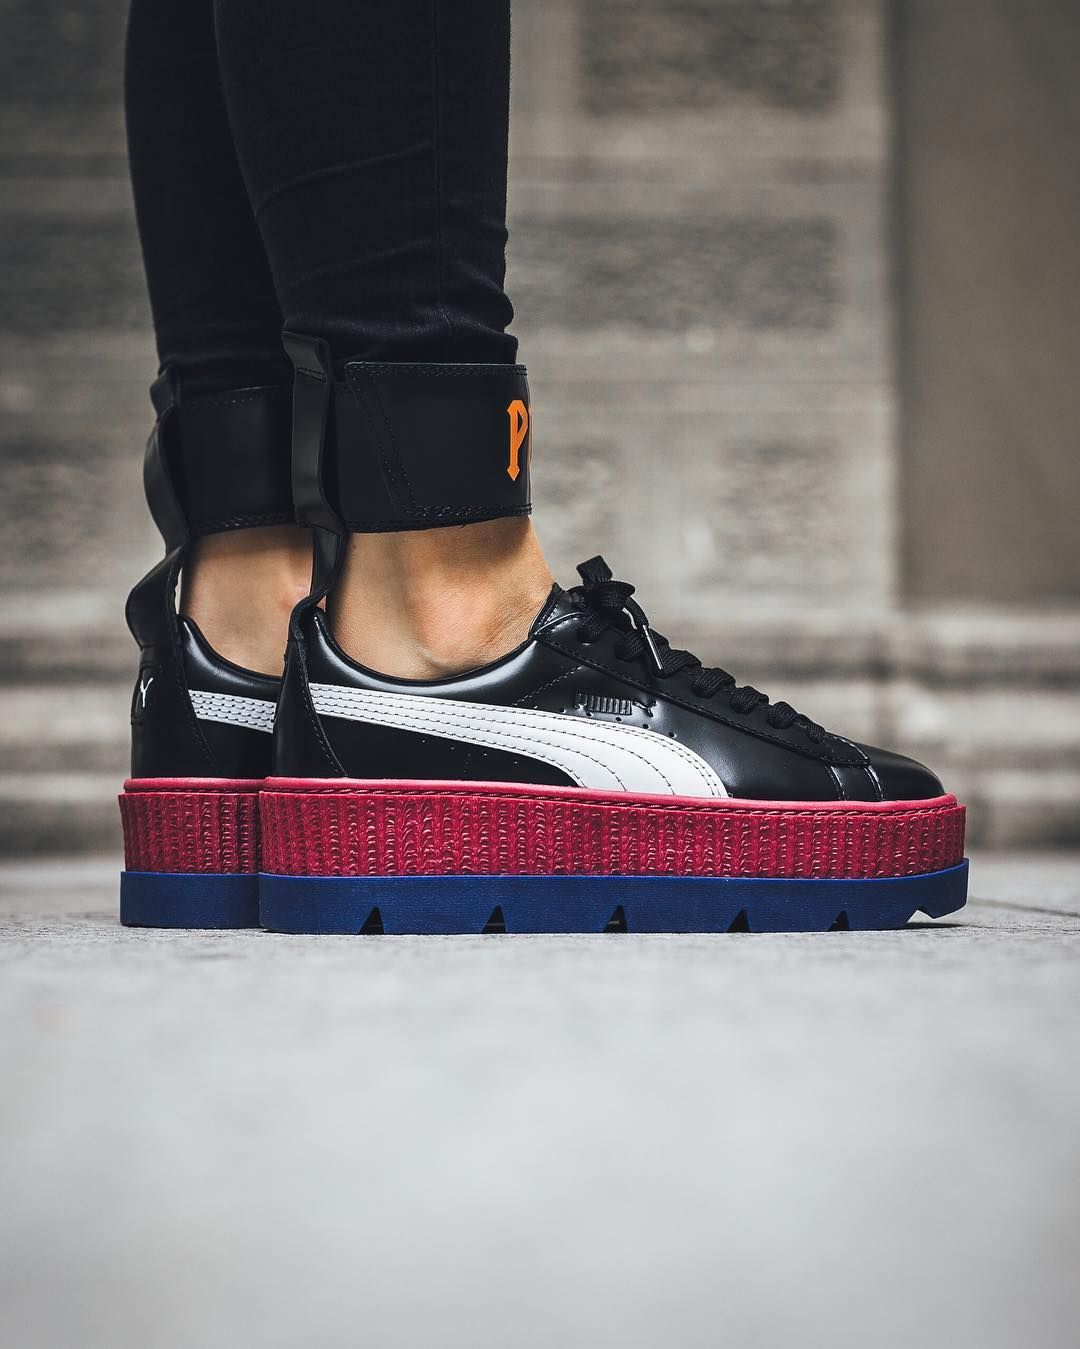 Fenty by Rihanna x PUMA Ankle Strap Sneaker W